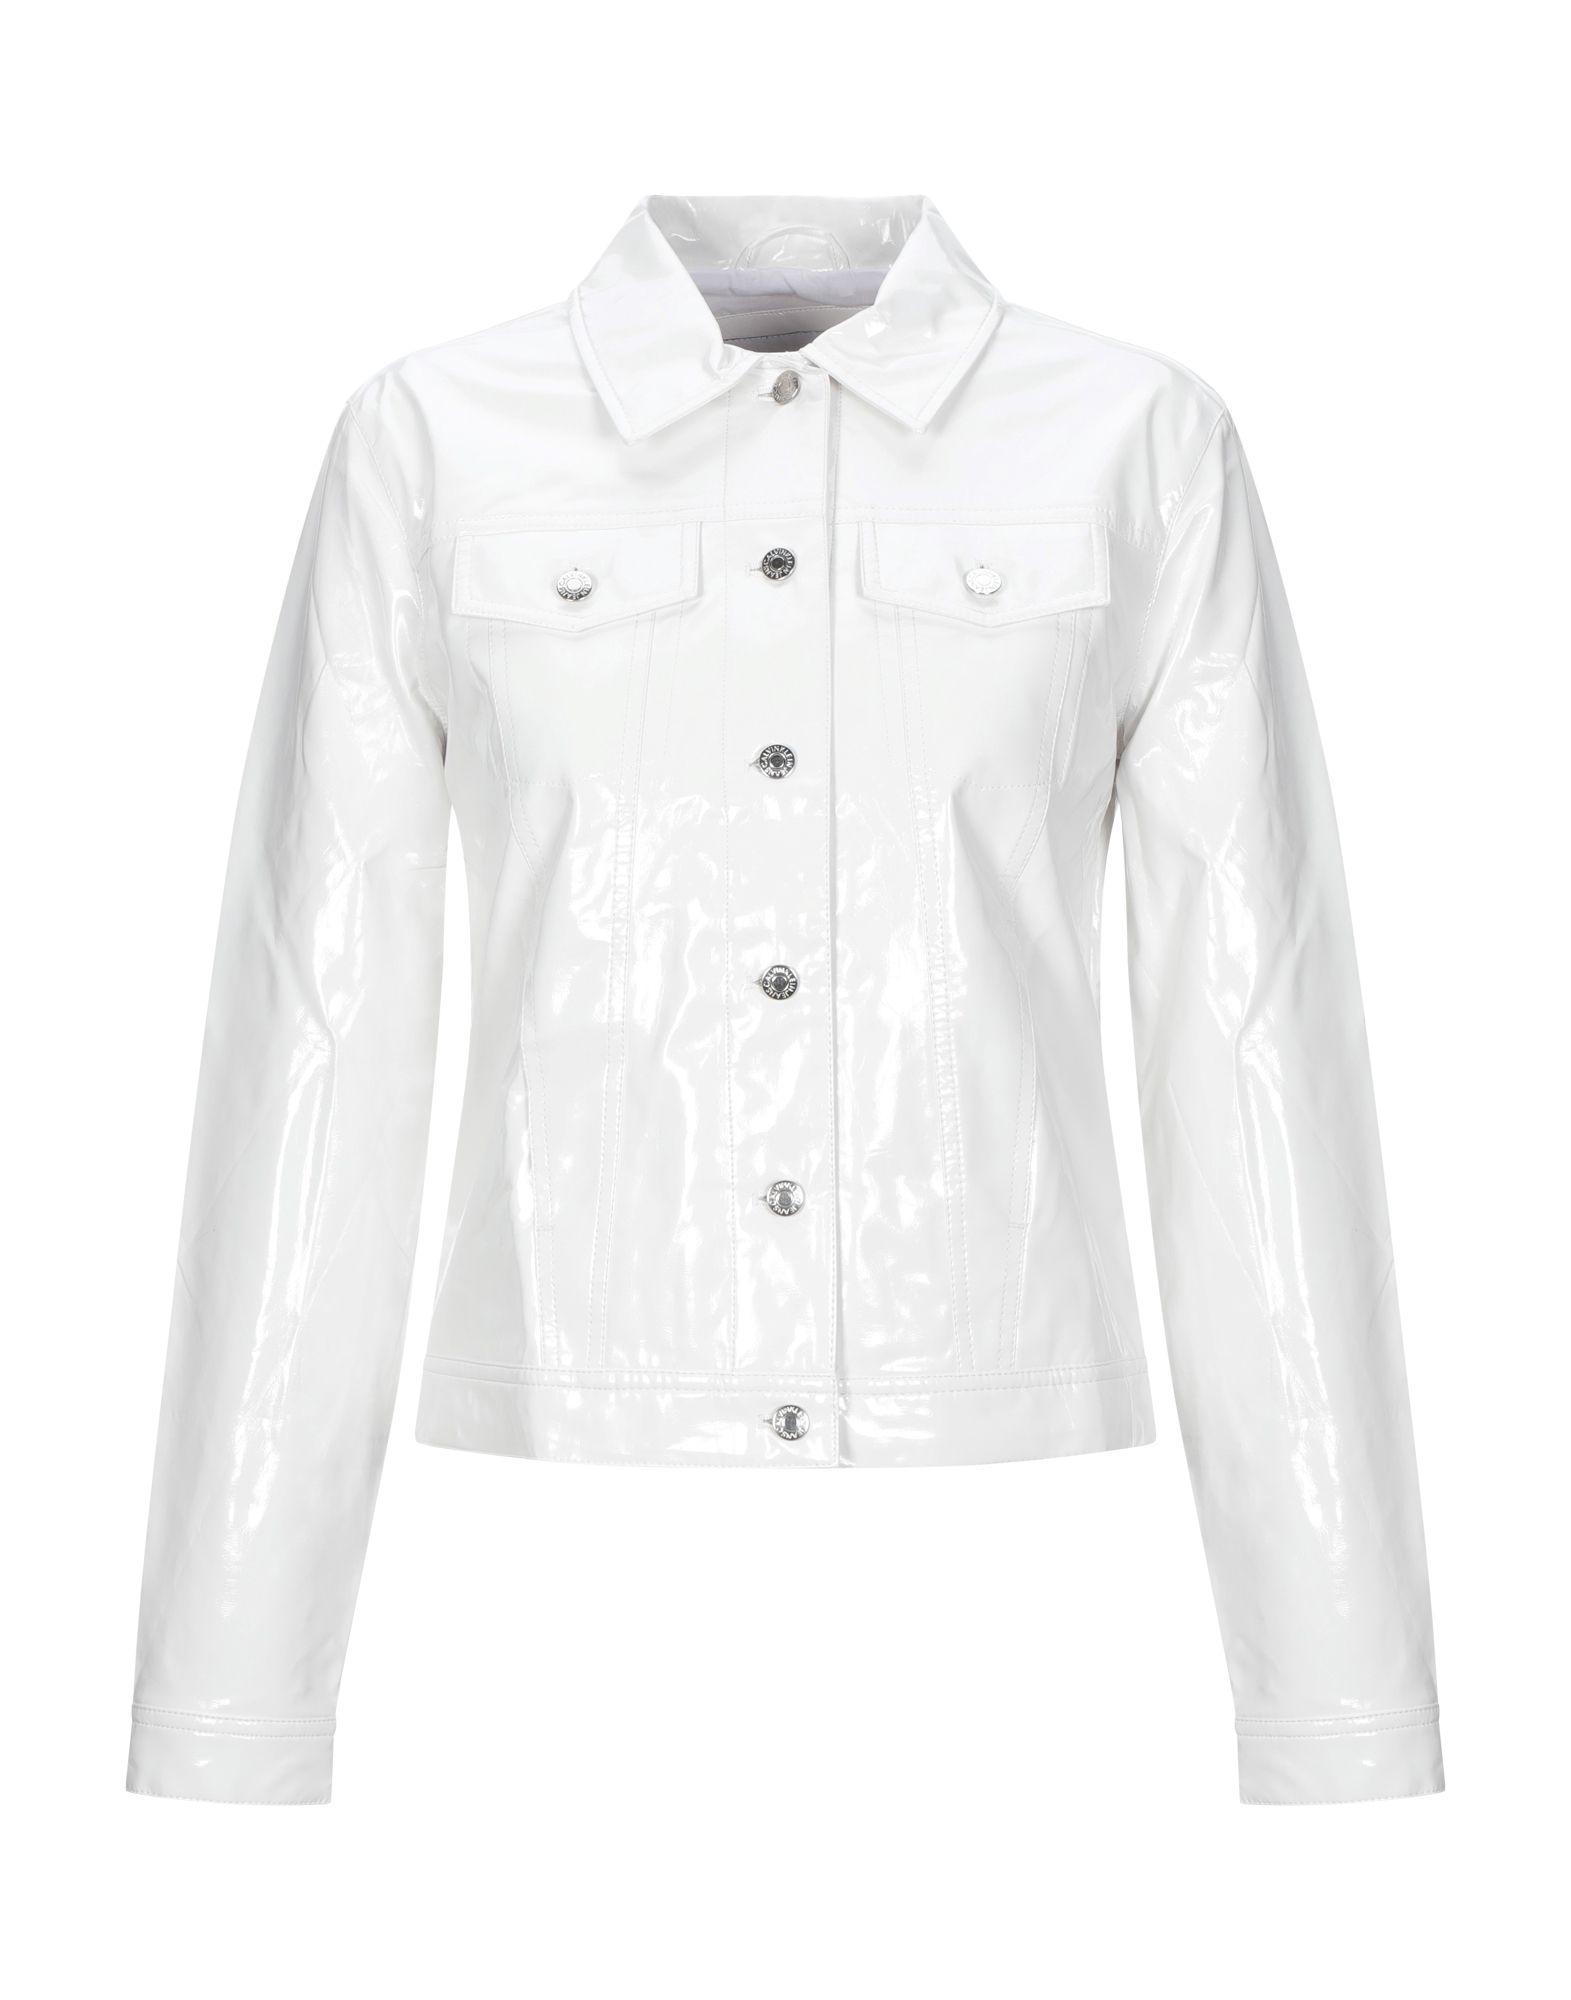 CALVIN KLEIN JEANS Куртка джинсы мужские calvin klein jeans цвет синий j30j306711 9113 размер 30 32 44 46 32